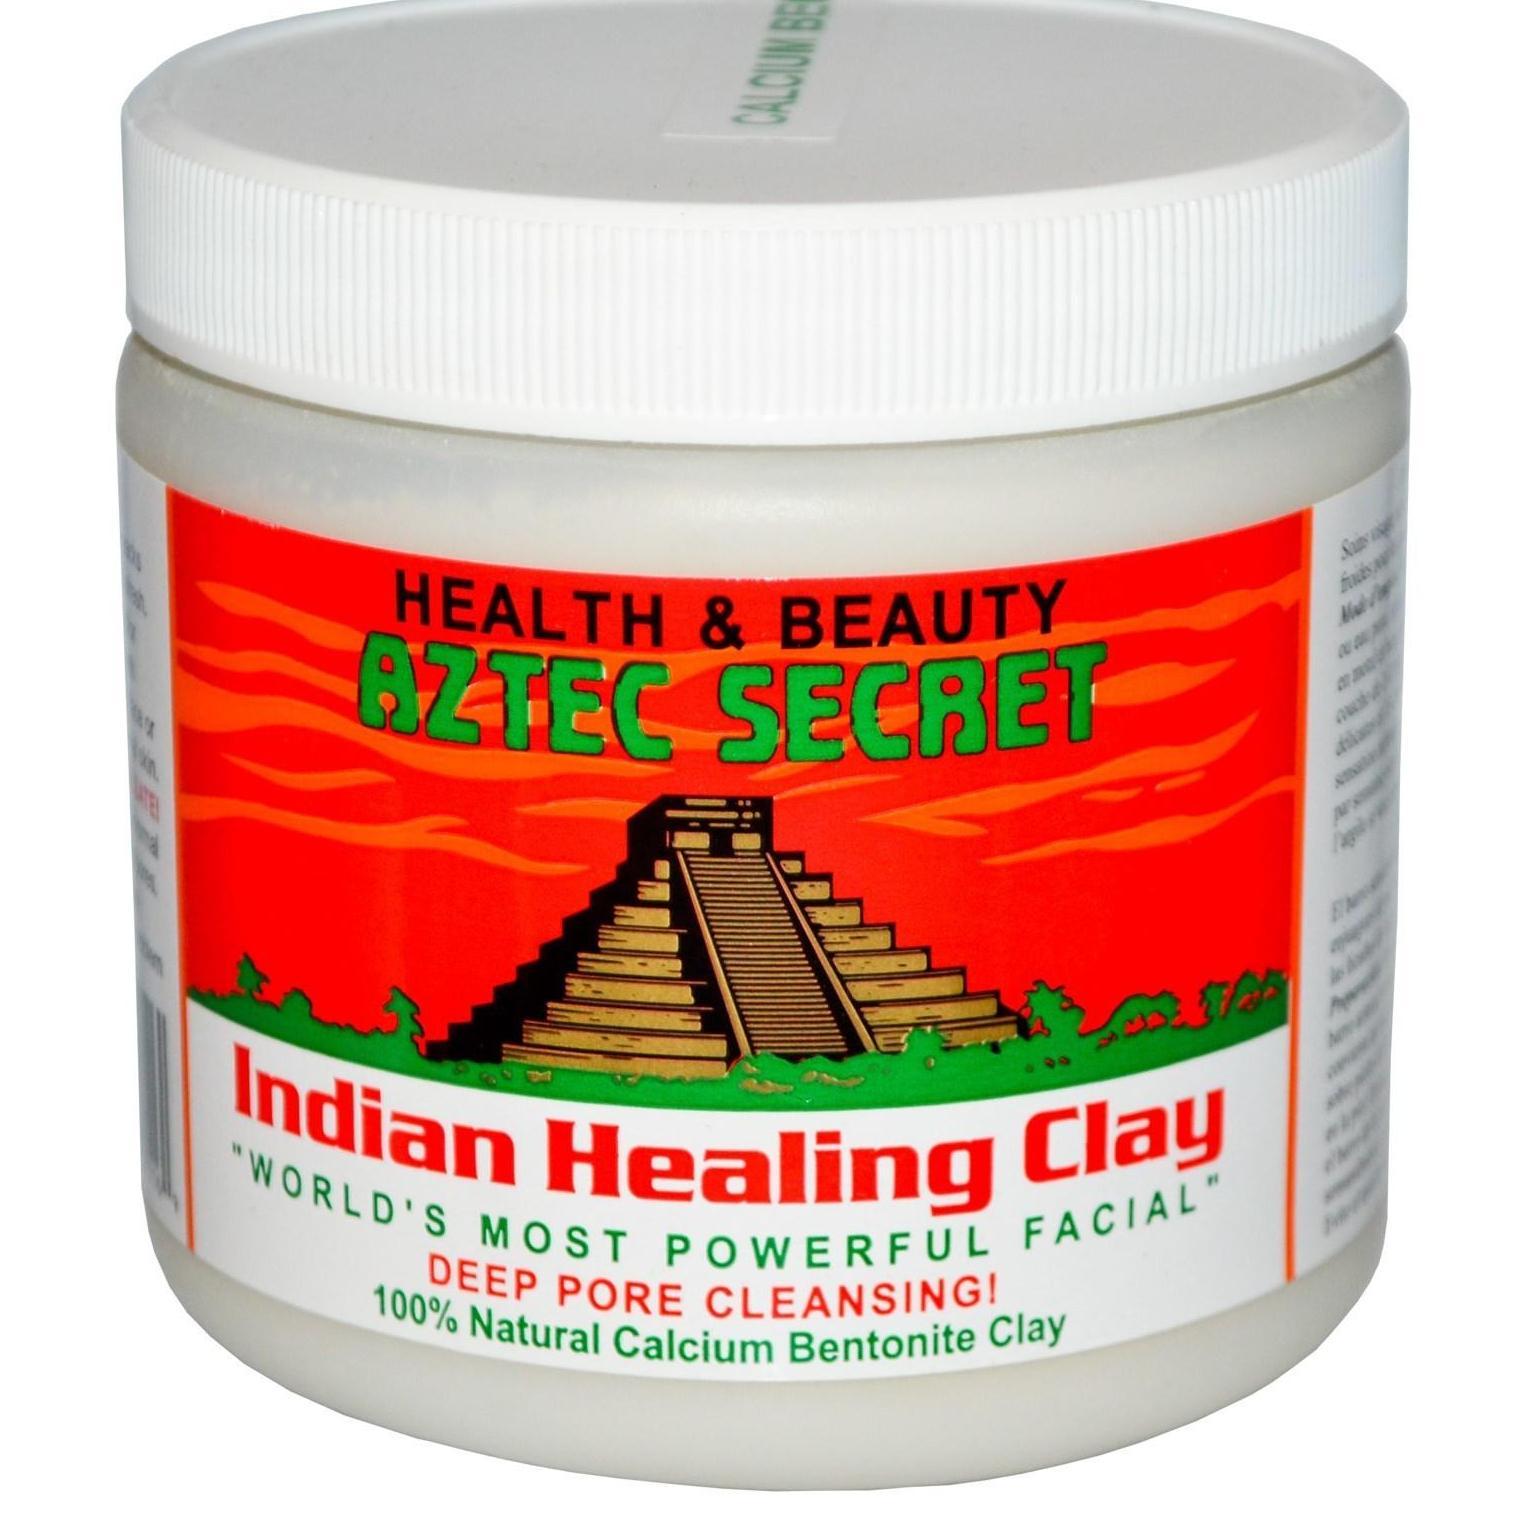 BỘT ĐẤT SÉT AZTEC SECRET INDIAN HEALING CLAY HỘP 454G tốt nhất